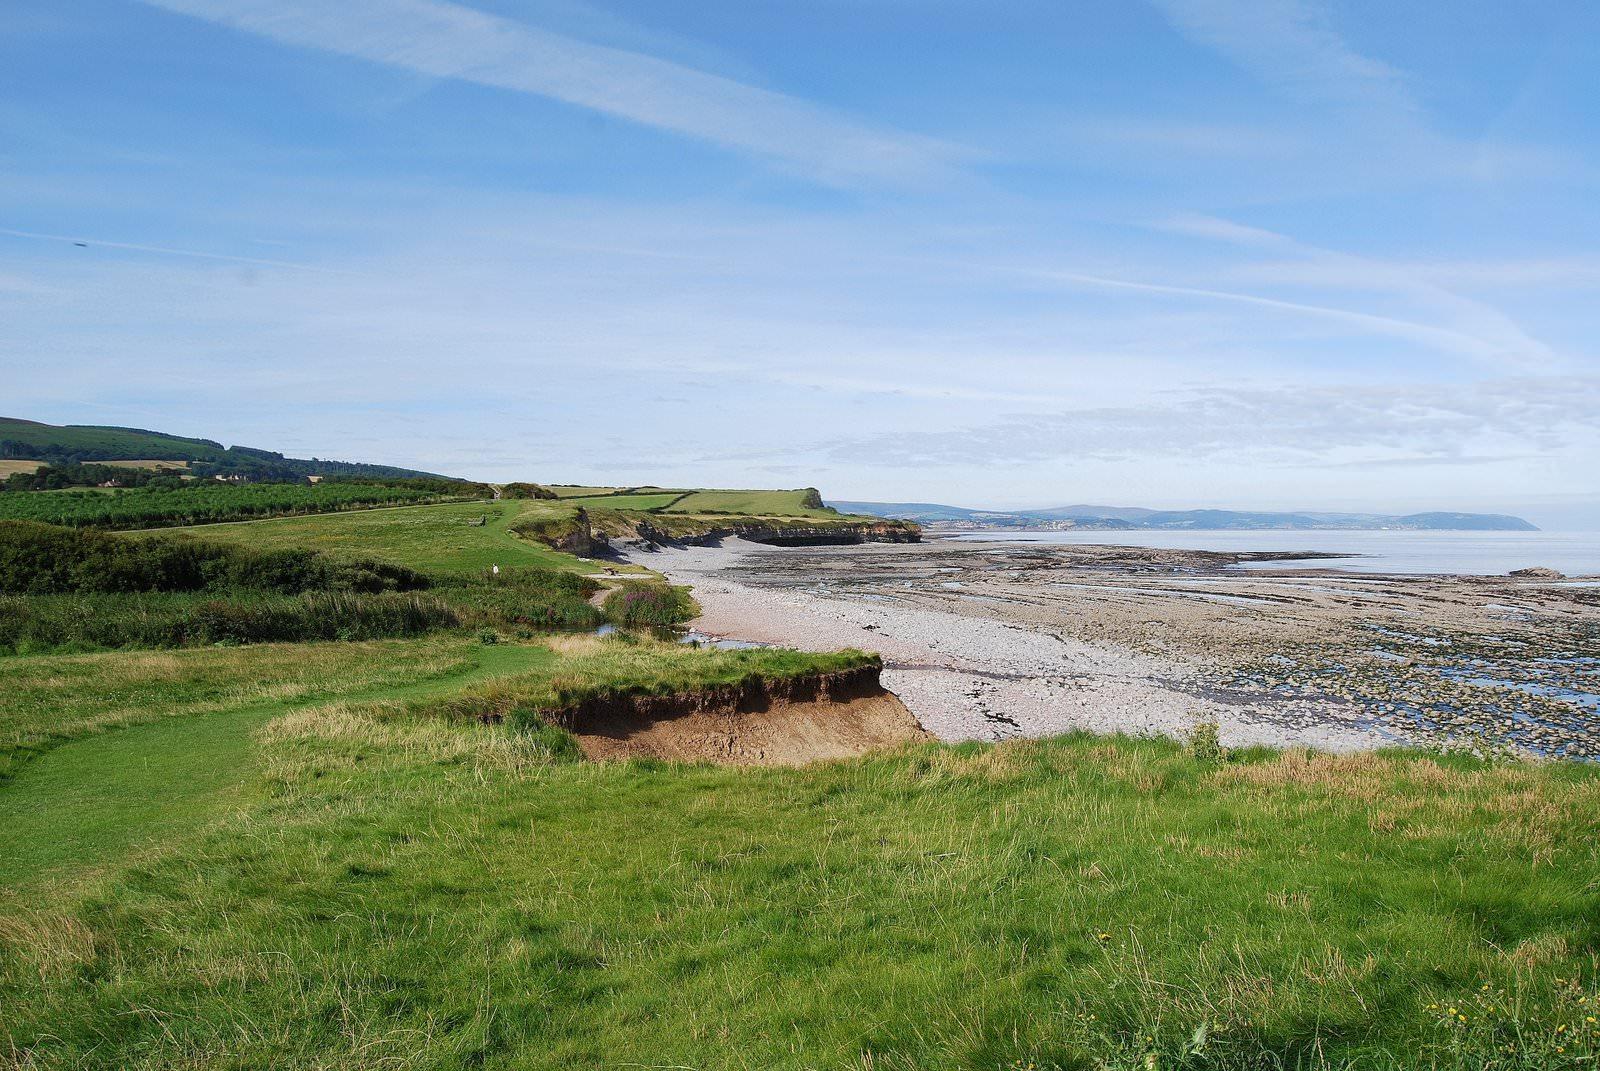 The Quantock Coastline